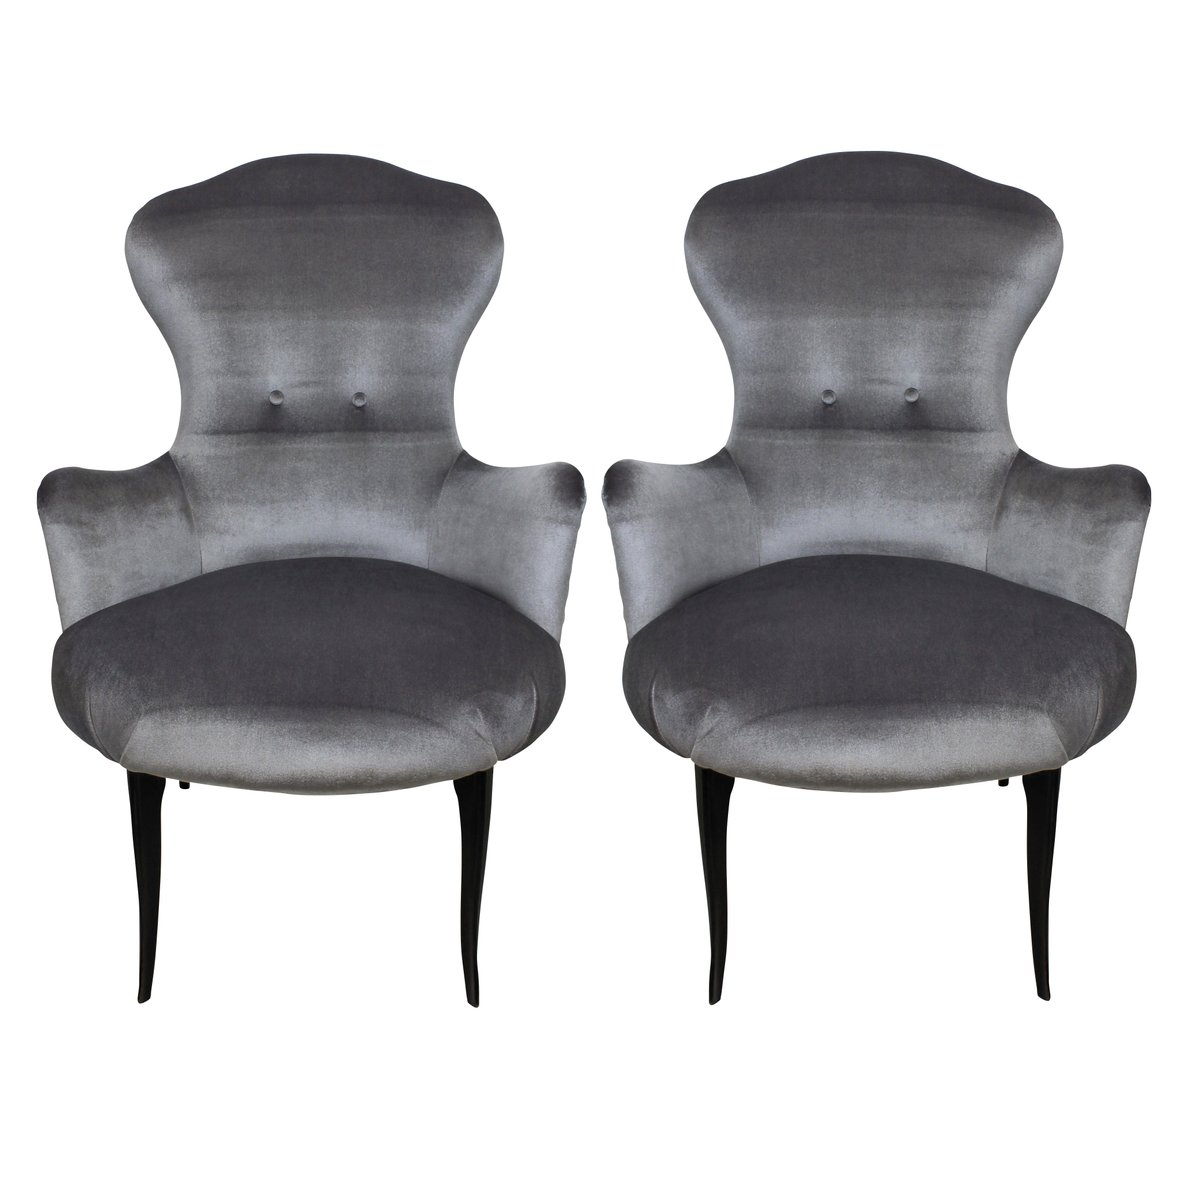 italian velvet bedroom easy chairs 1950s set of 2 for sale at pamono